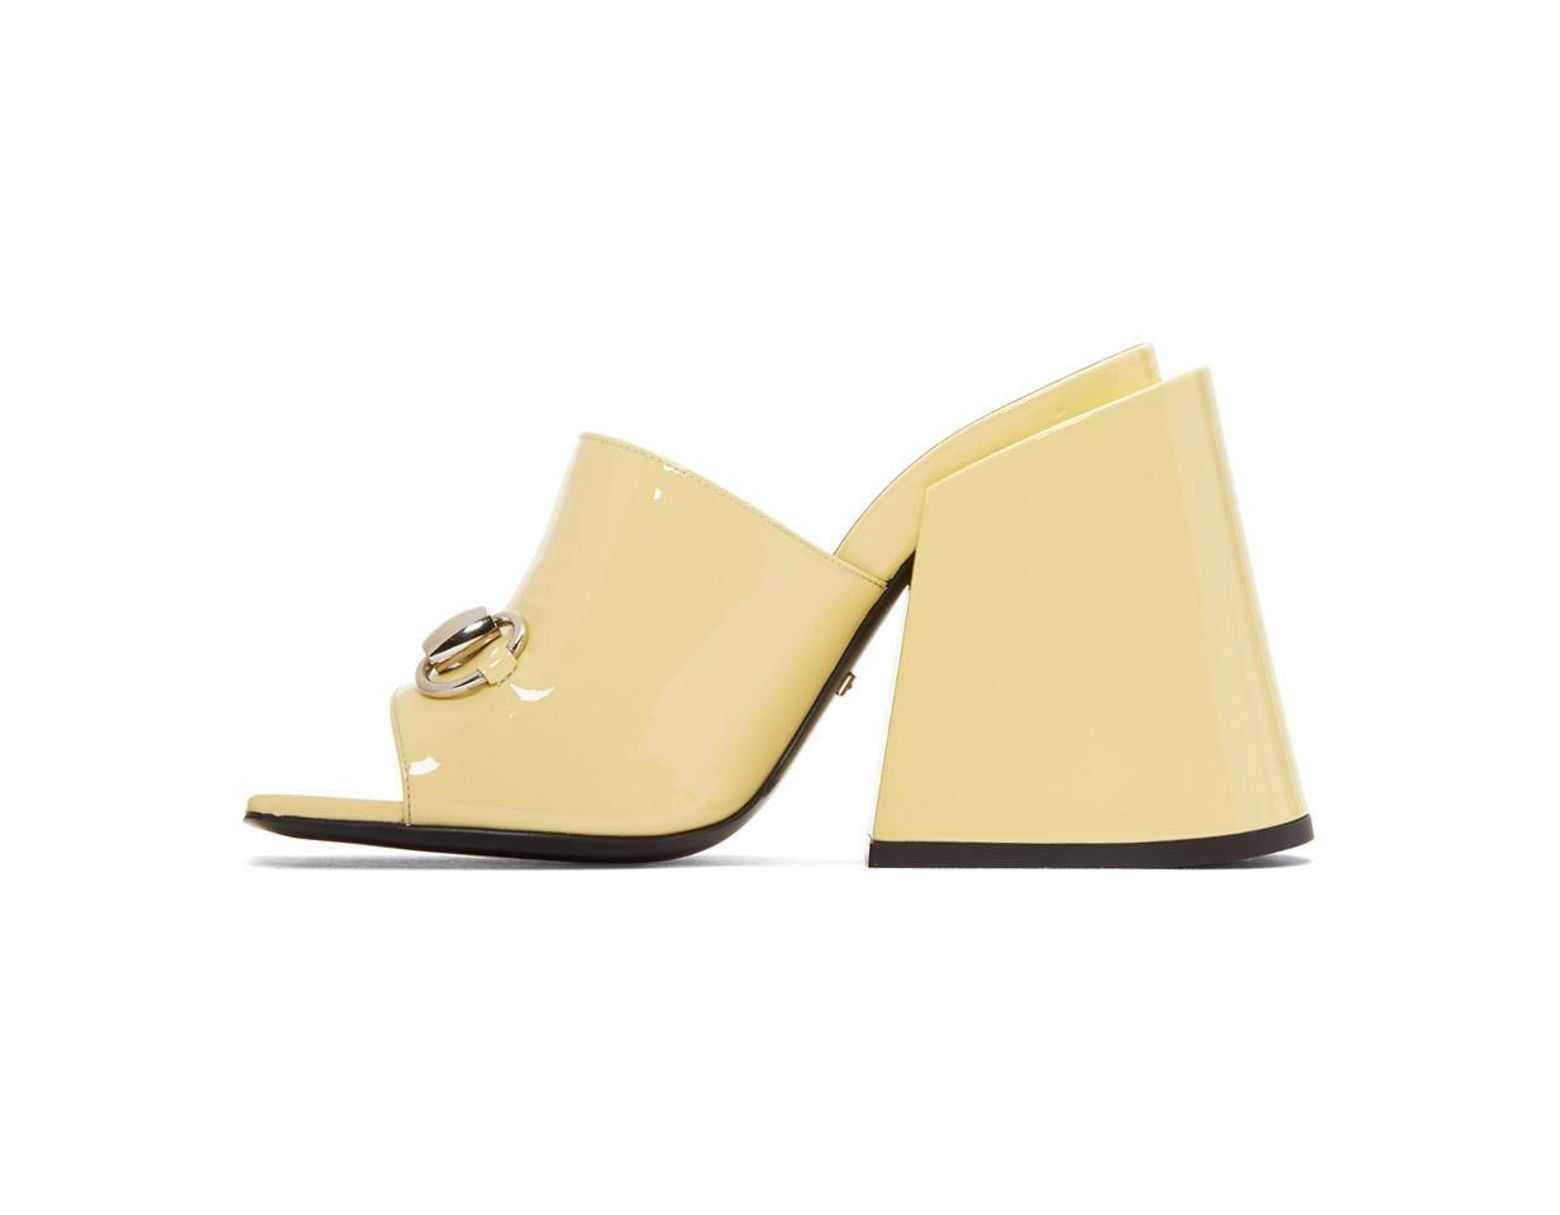 8de630c9424 Lyst - Gucci Yellow Patent Lexi Horsebit Sandals